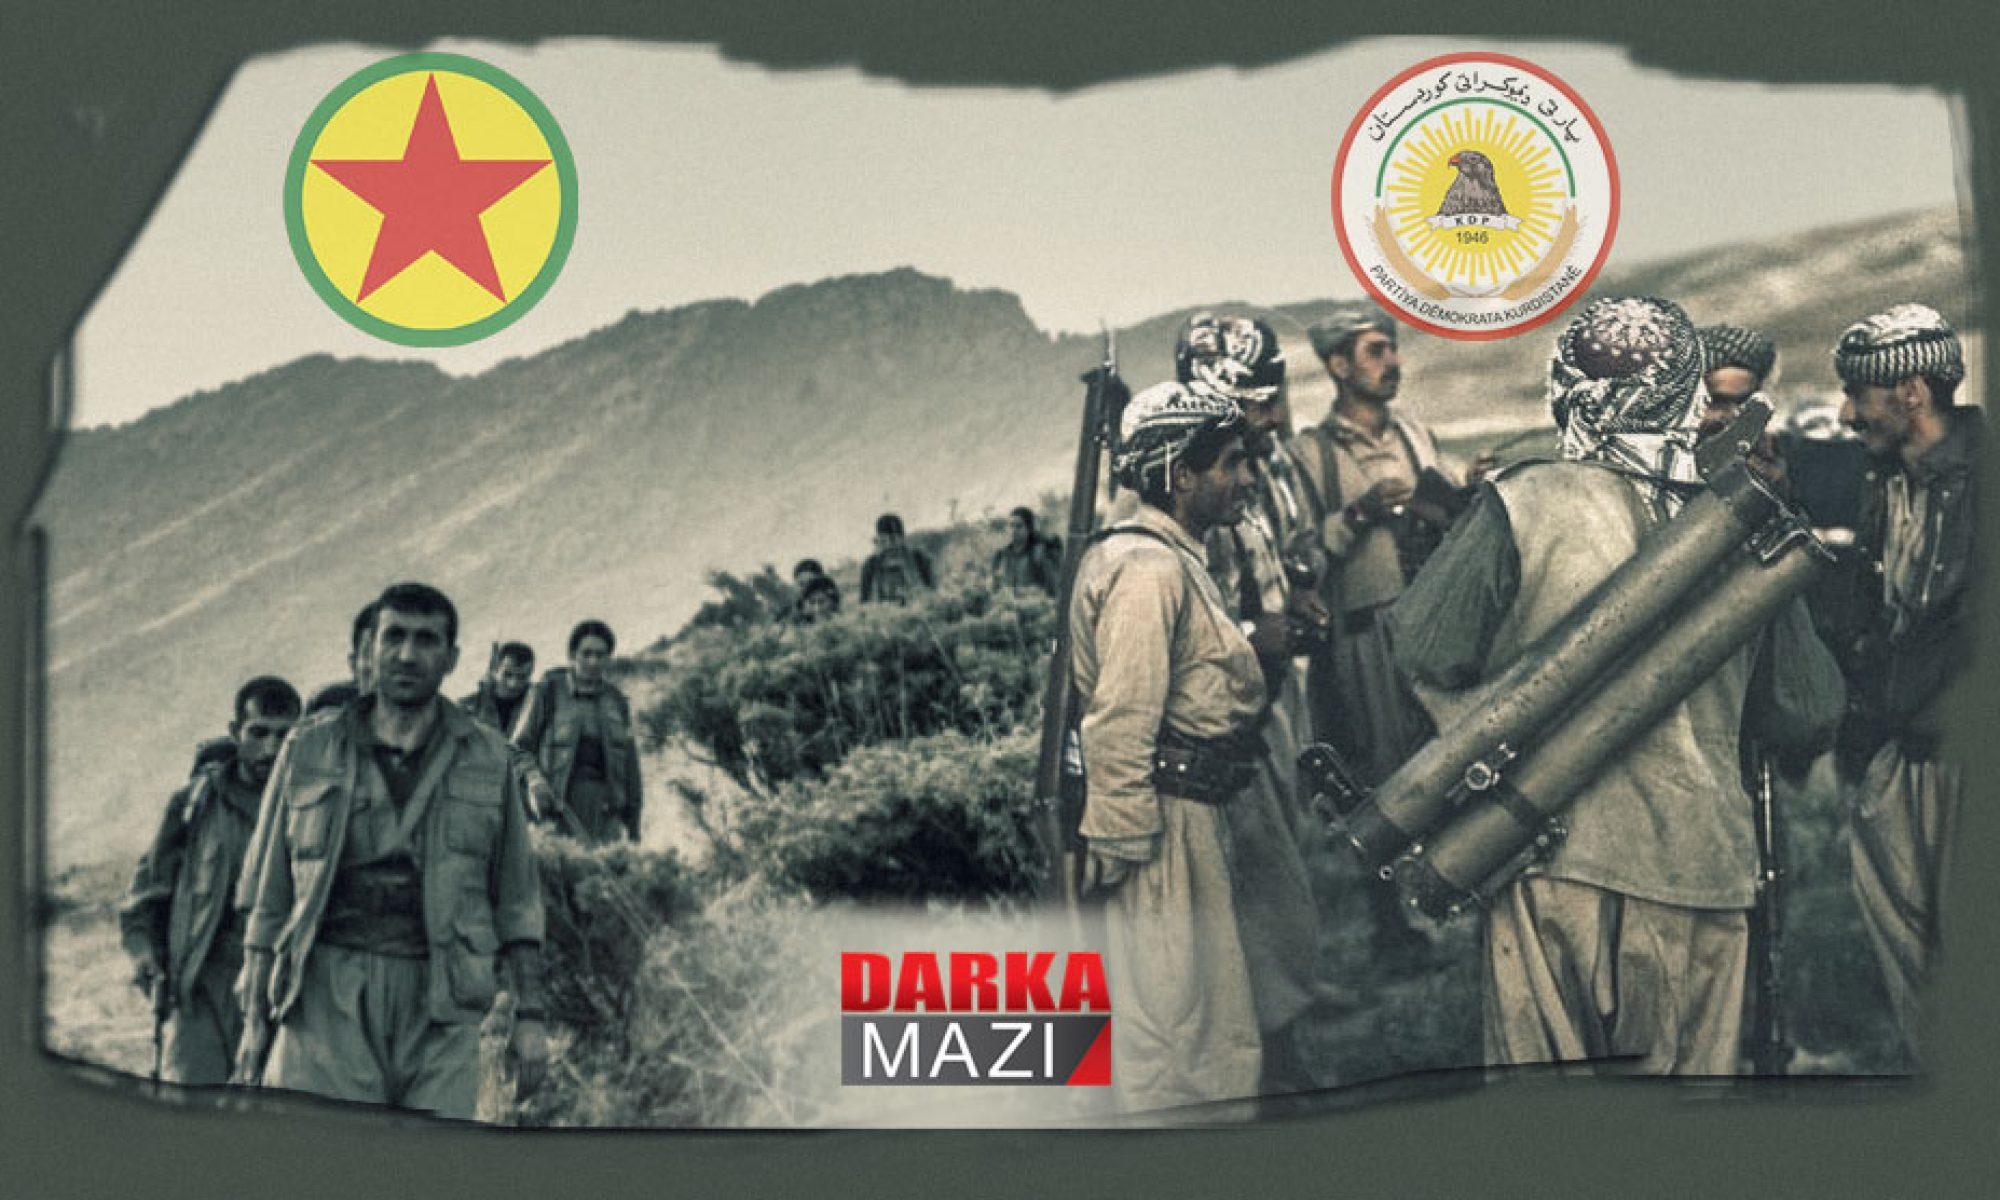 ئۆجالان ههر ل دهستپێكێ PKK ژێر ب ژێر ل دژی PDK ئاراسته كر